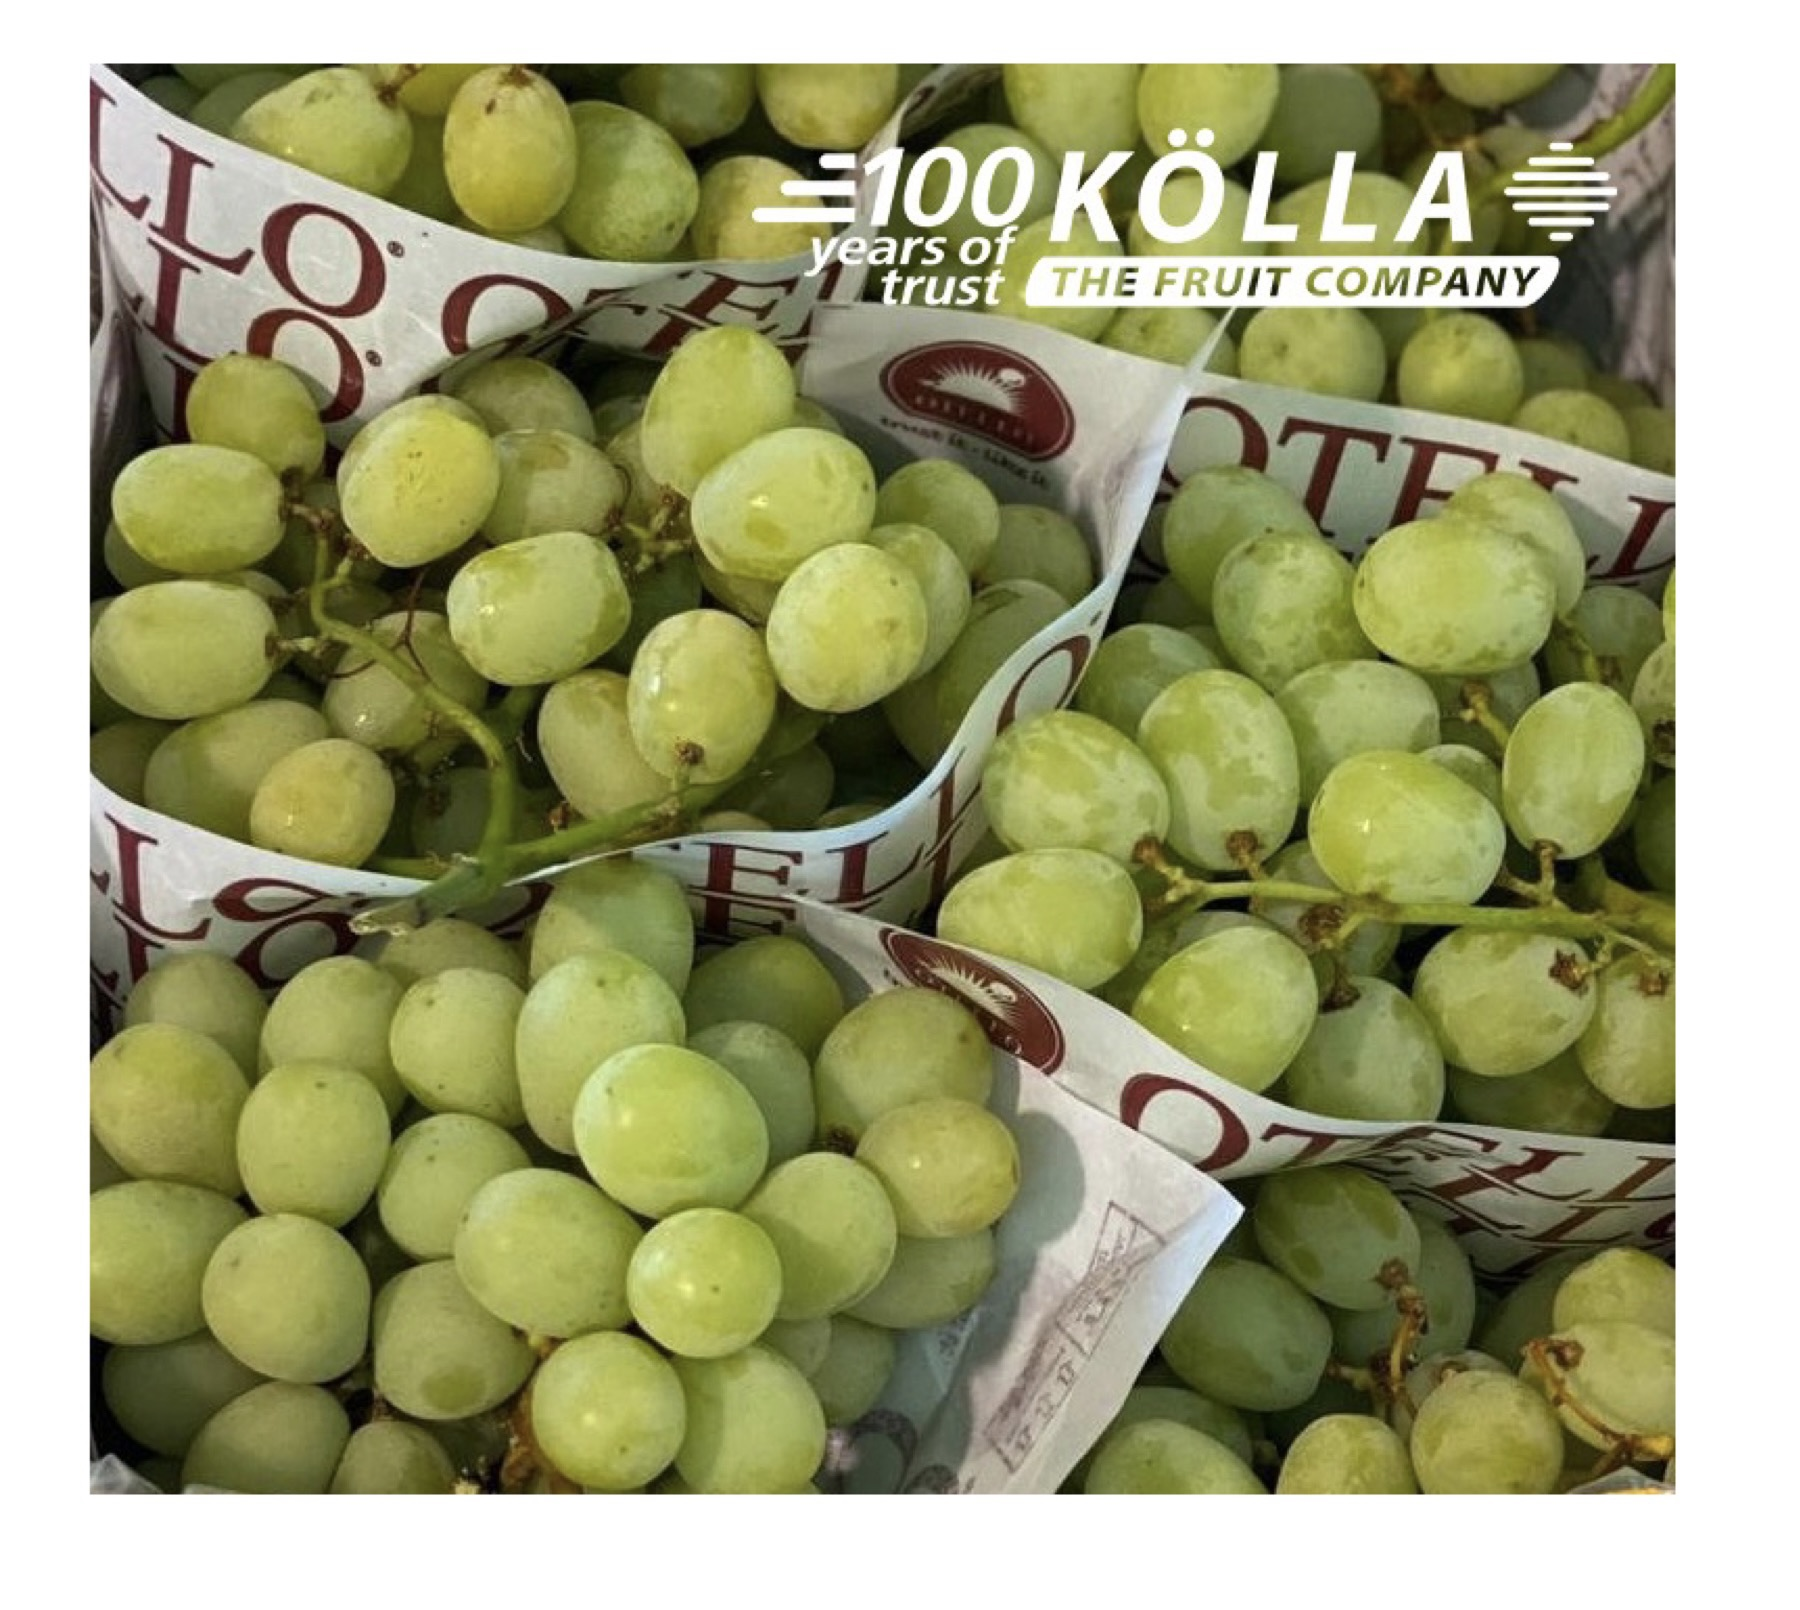 Sustainability - 1.3 million fewer foam separators in grape packaging in the last 2 years